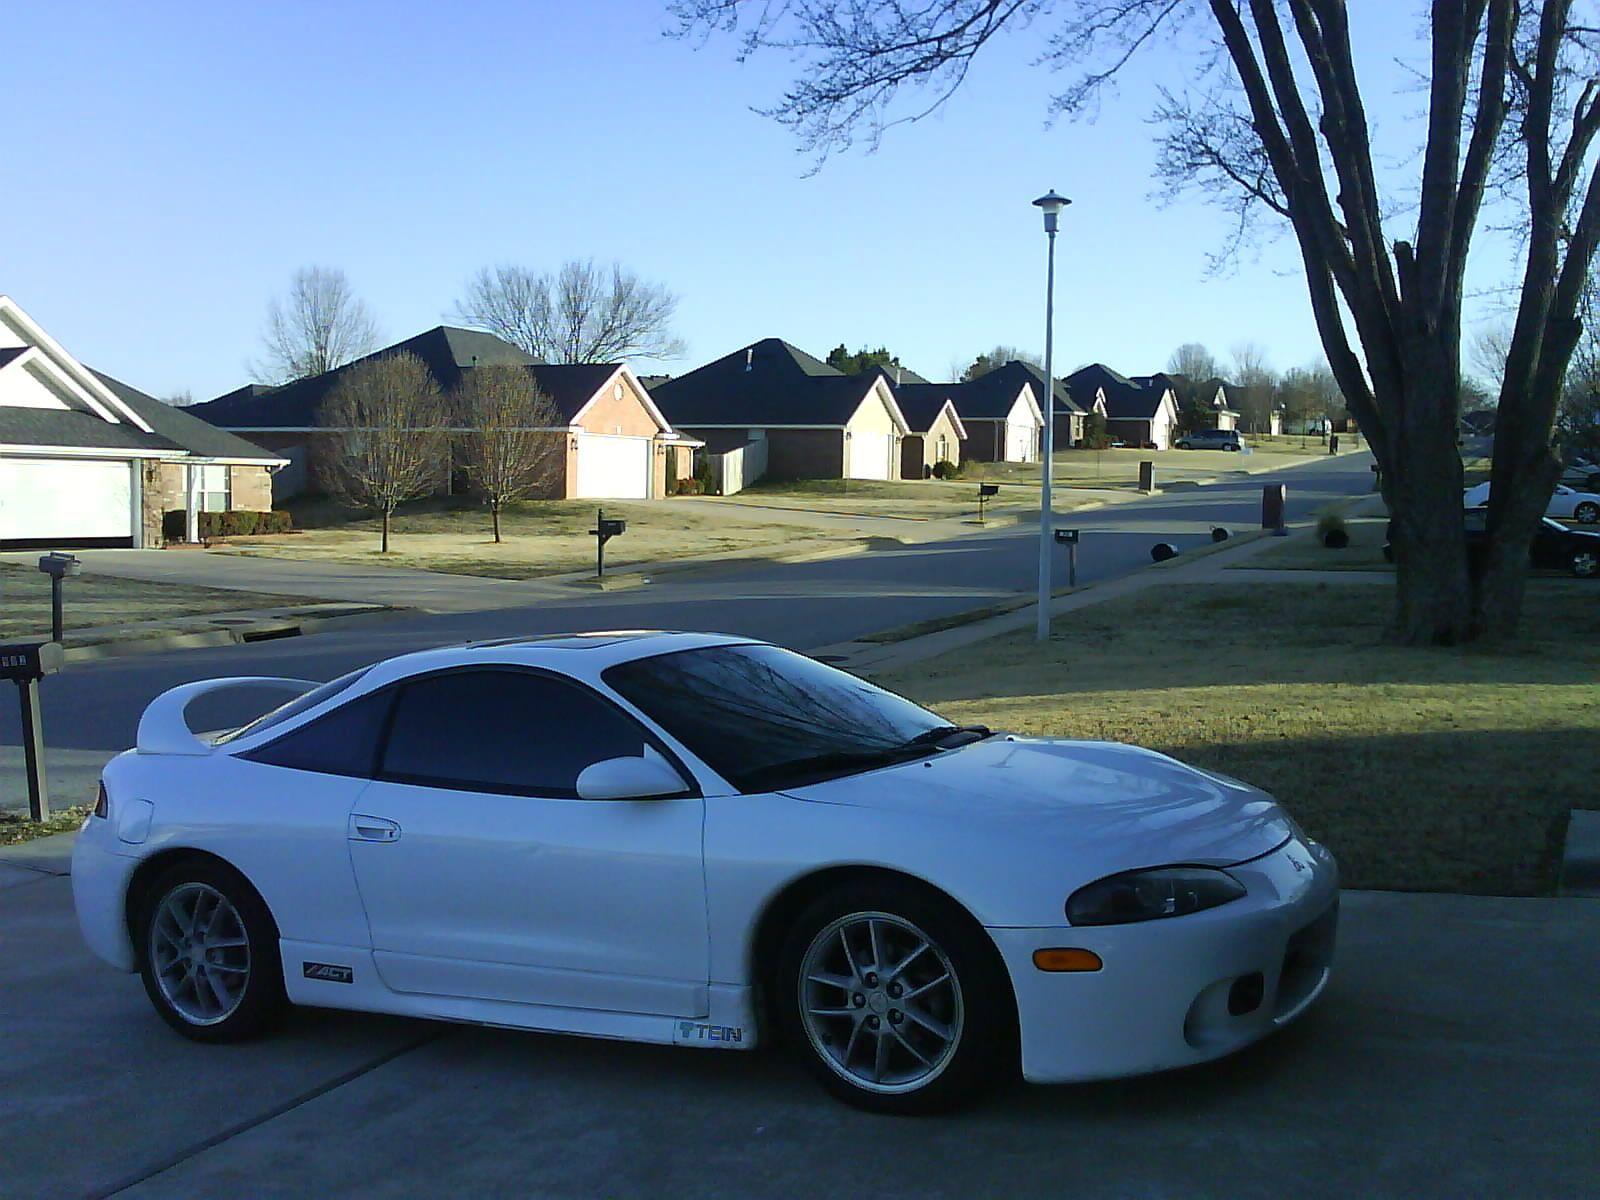 My dream car 1999 mitsubishi eclipse gsx 3